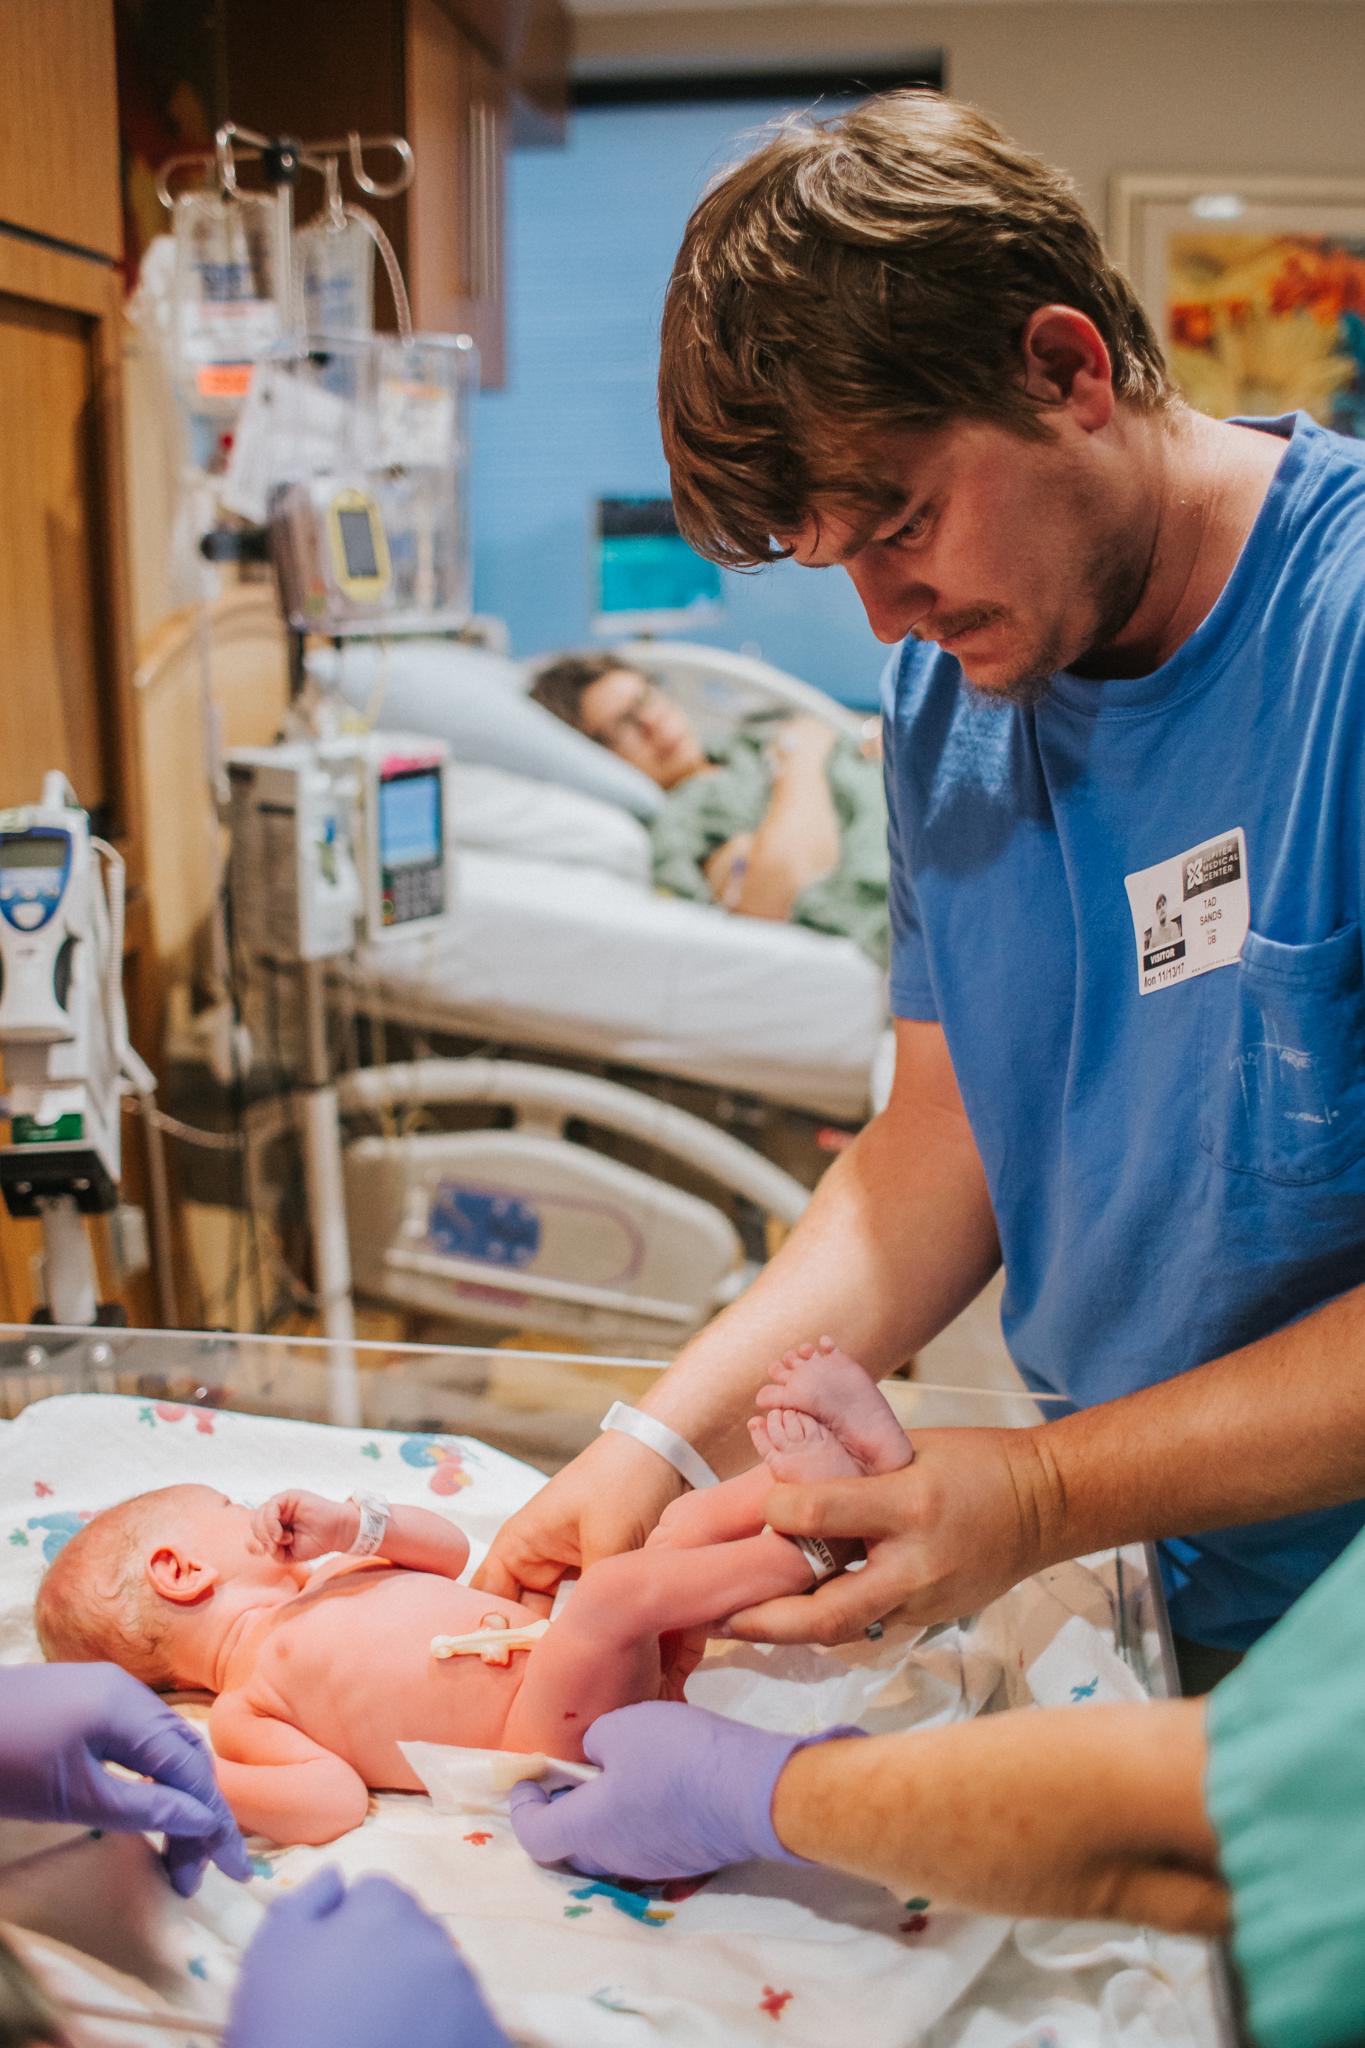 boca hospital best obgyn reviews boca midwifery lubetkin courtney mcmillian.jpg